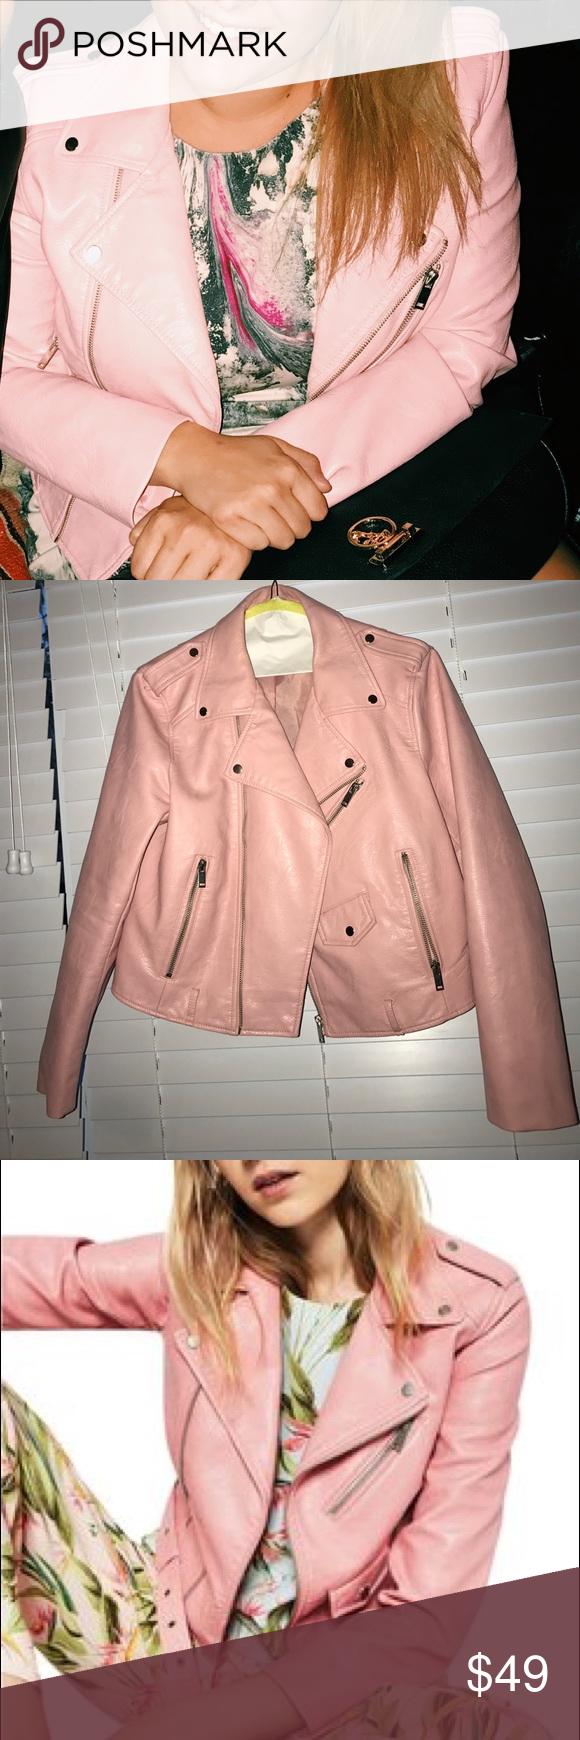 Zara Blush Pink Faux Leather Motorcycle Jacket SzL One of